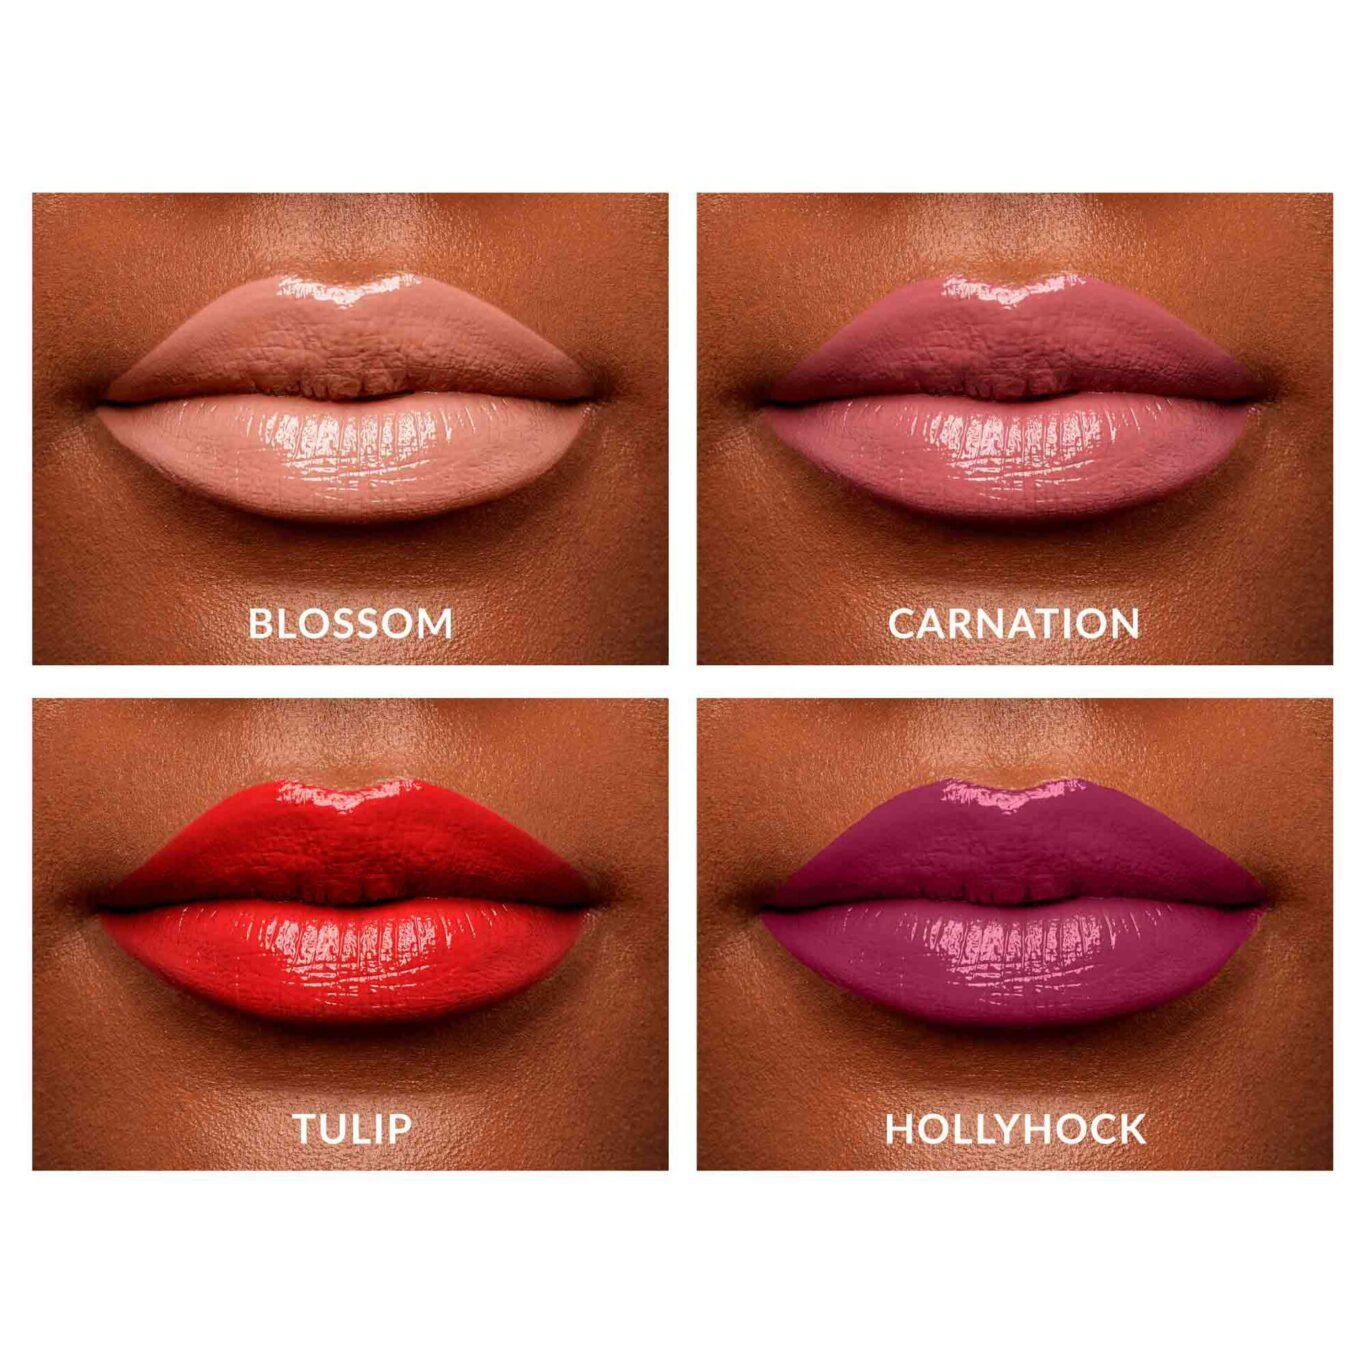 KVD Vegan Beauty Holiday Collection 2020 XO Vinyl Obsession Mini Lip Set Lip Swatch Deep